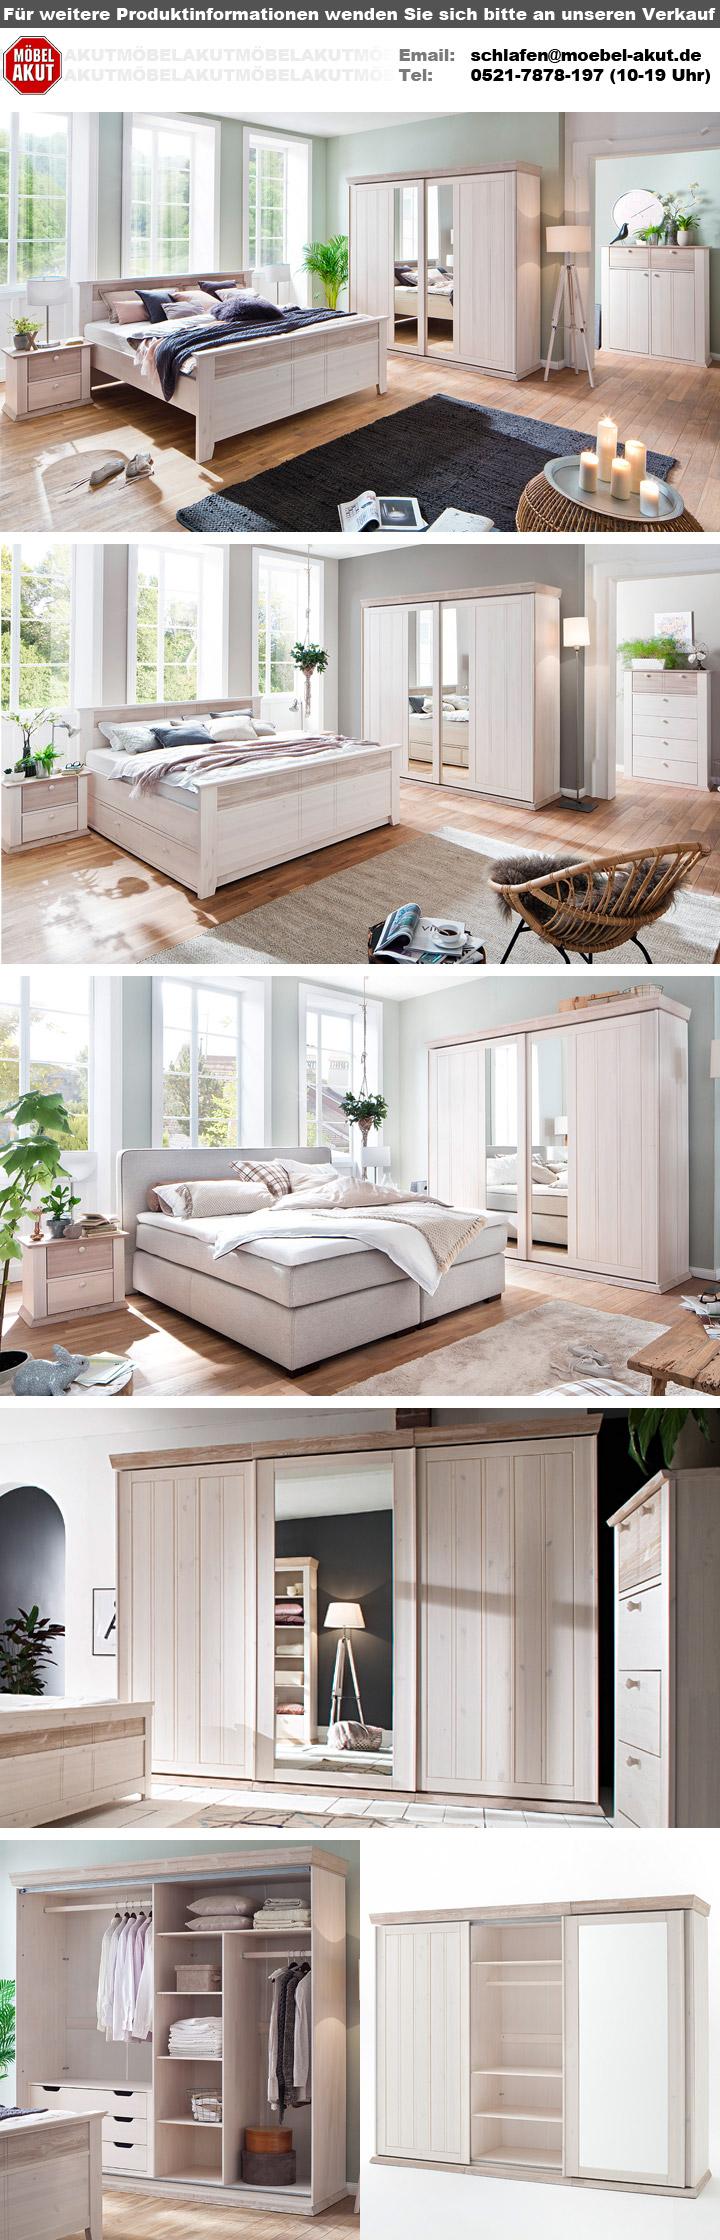 nachtkommode g teborg nachtschrank kiefer massiv wei milan. Black Bedroom Furniture Sets. Home Design Ideas